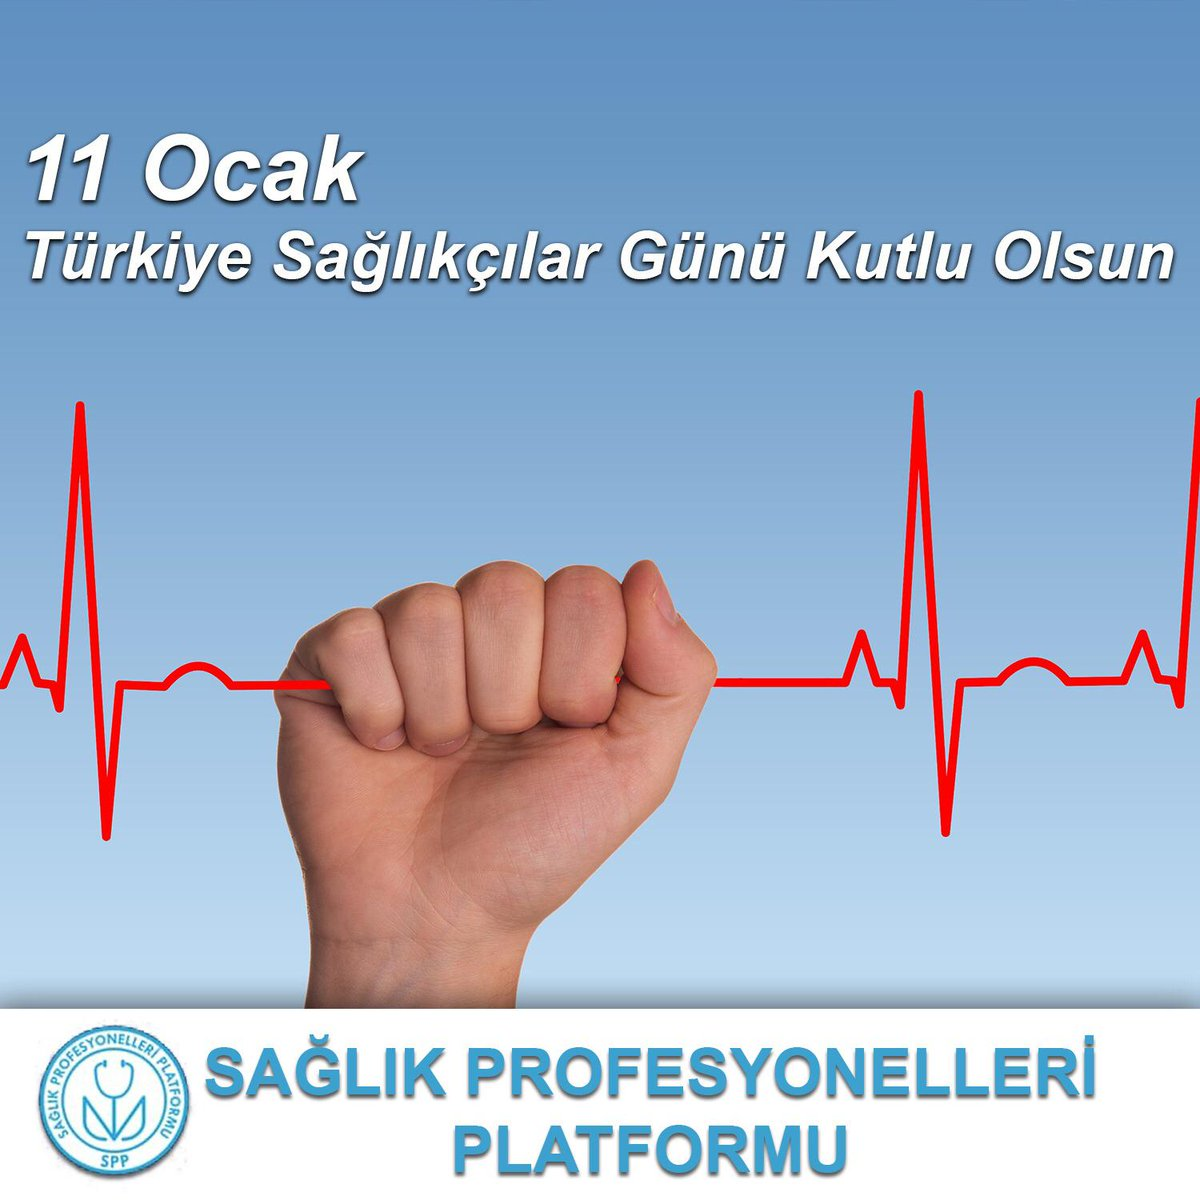 TMRT-Der's photo on #11OcakTurkiyeSaglikcilarGunu